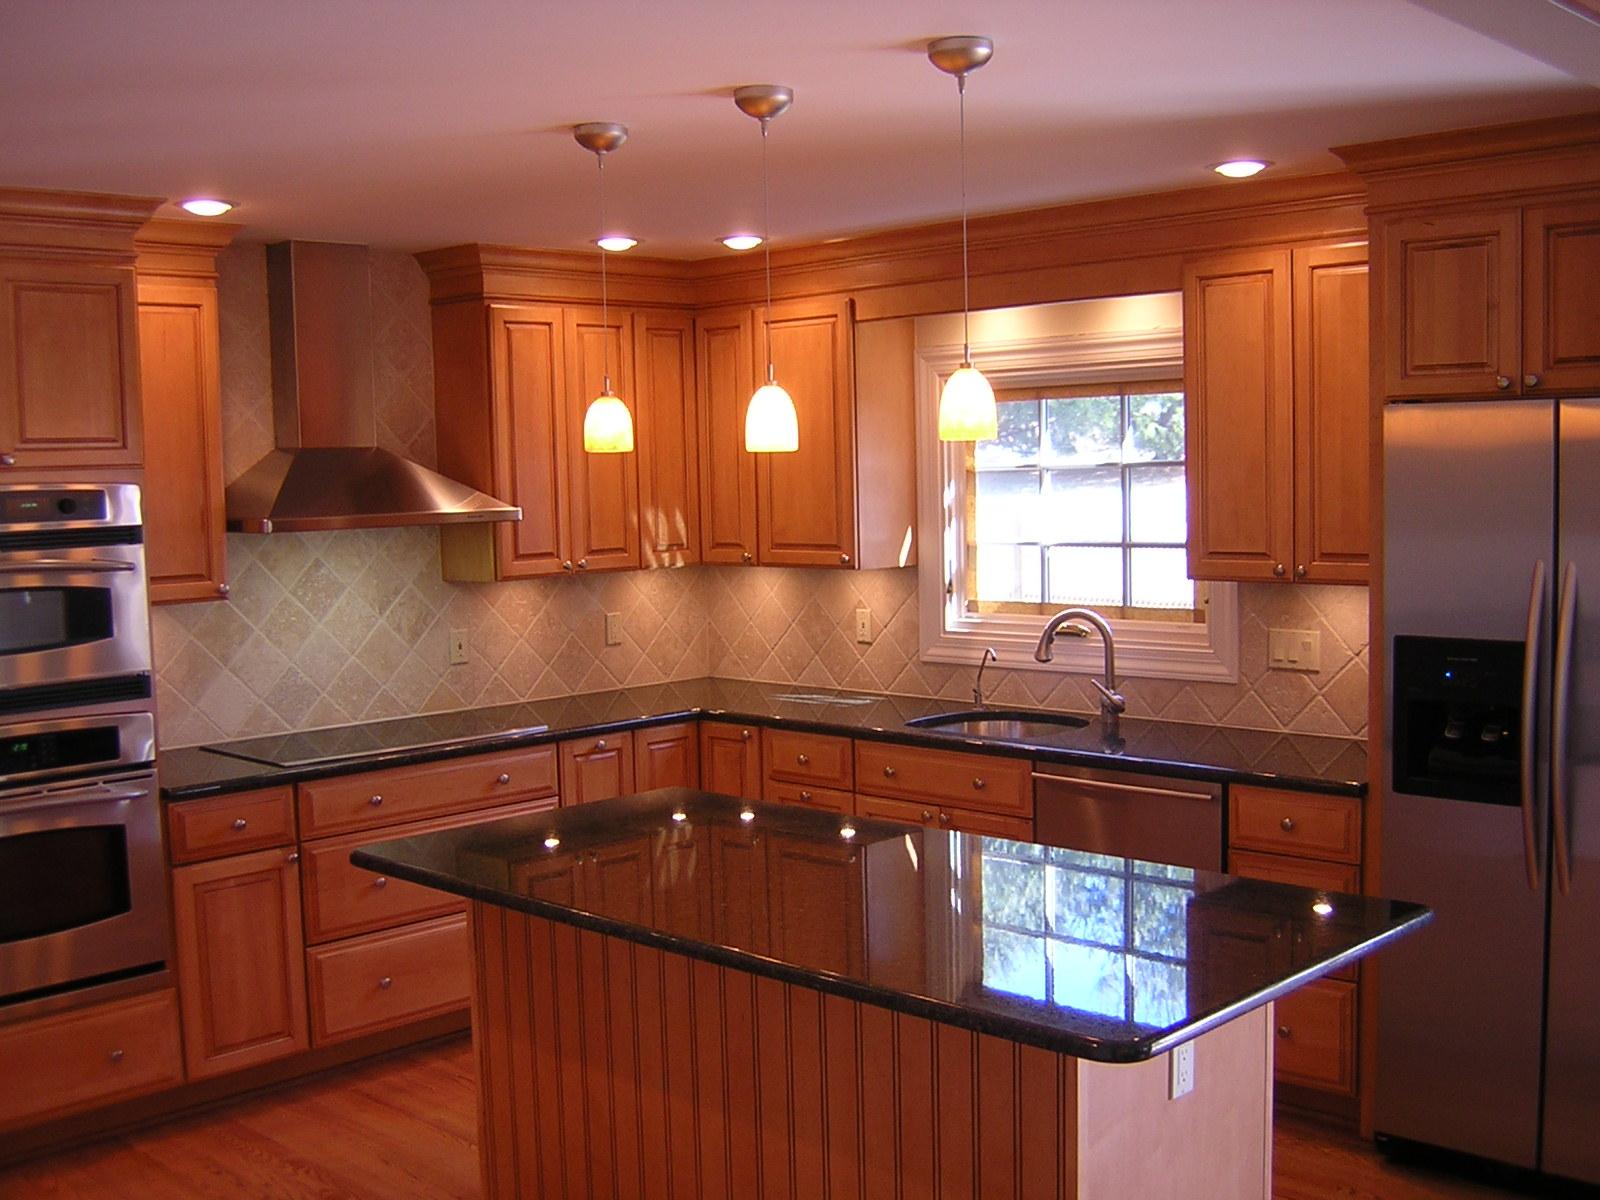 granite kitchen design ideas photo - 1